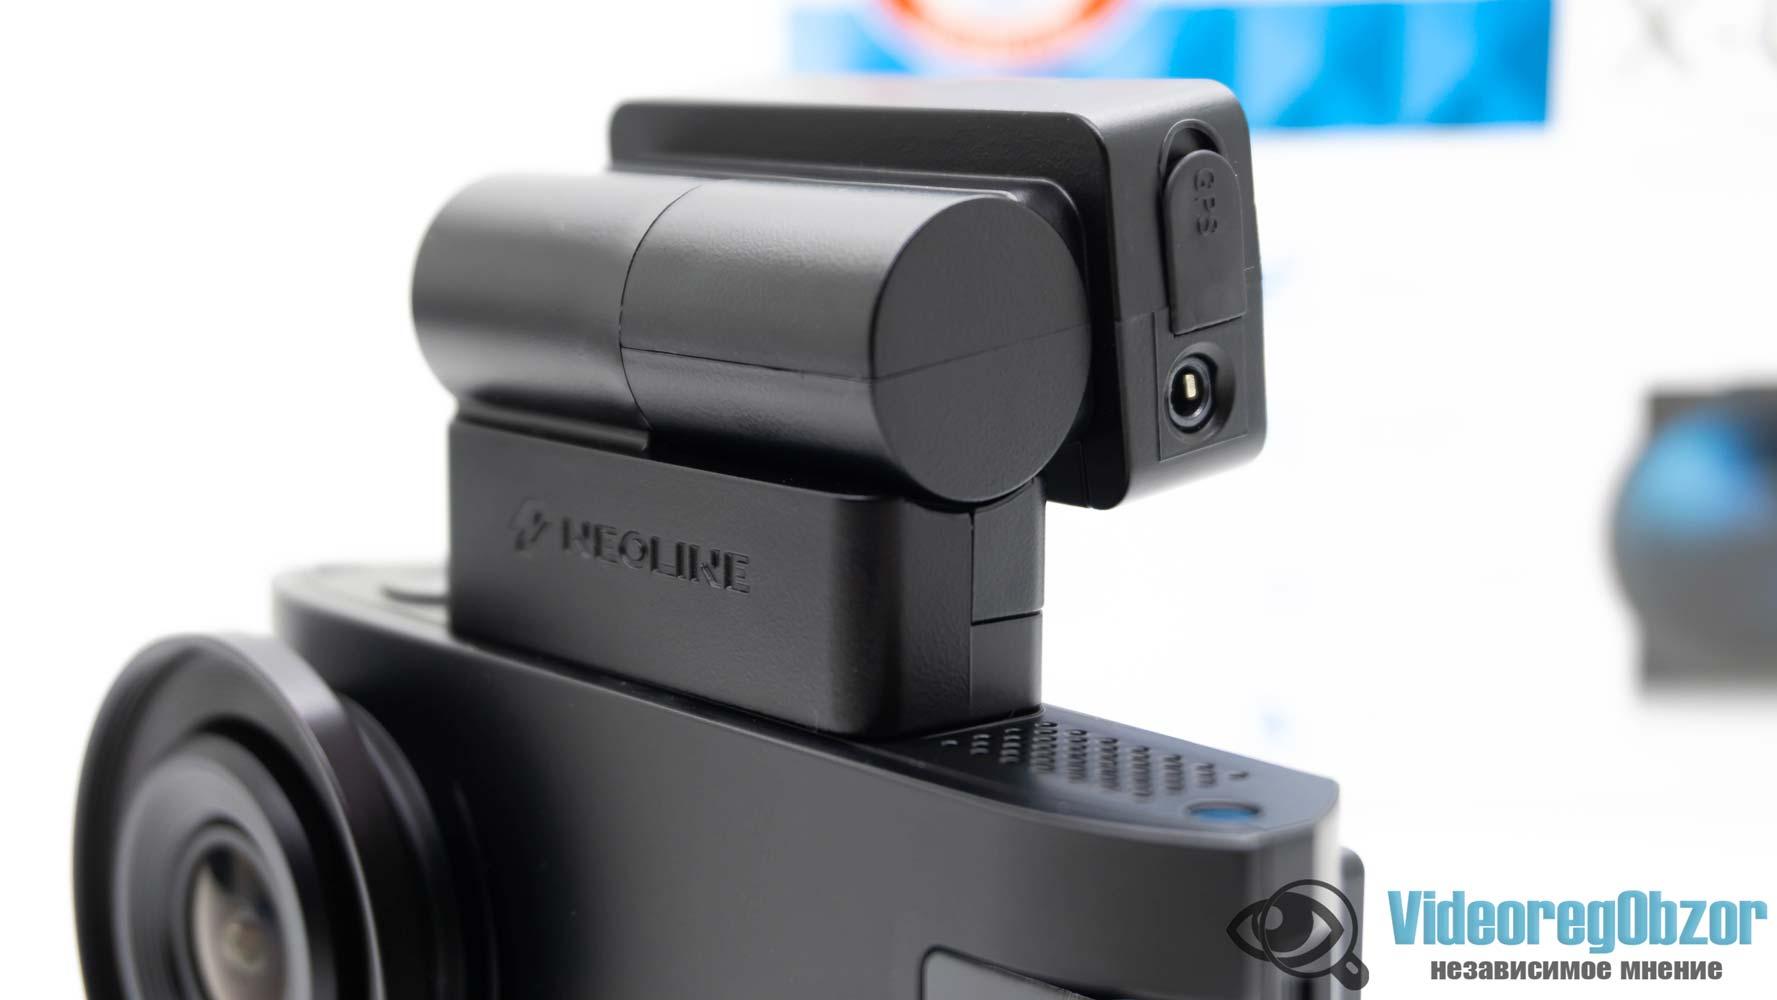 Neoline X COP 9200 обзор 20 VideoregObzor Neoline X-COP 9200: обзор видеорегистратора с радар-детектором